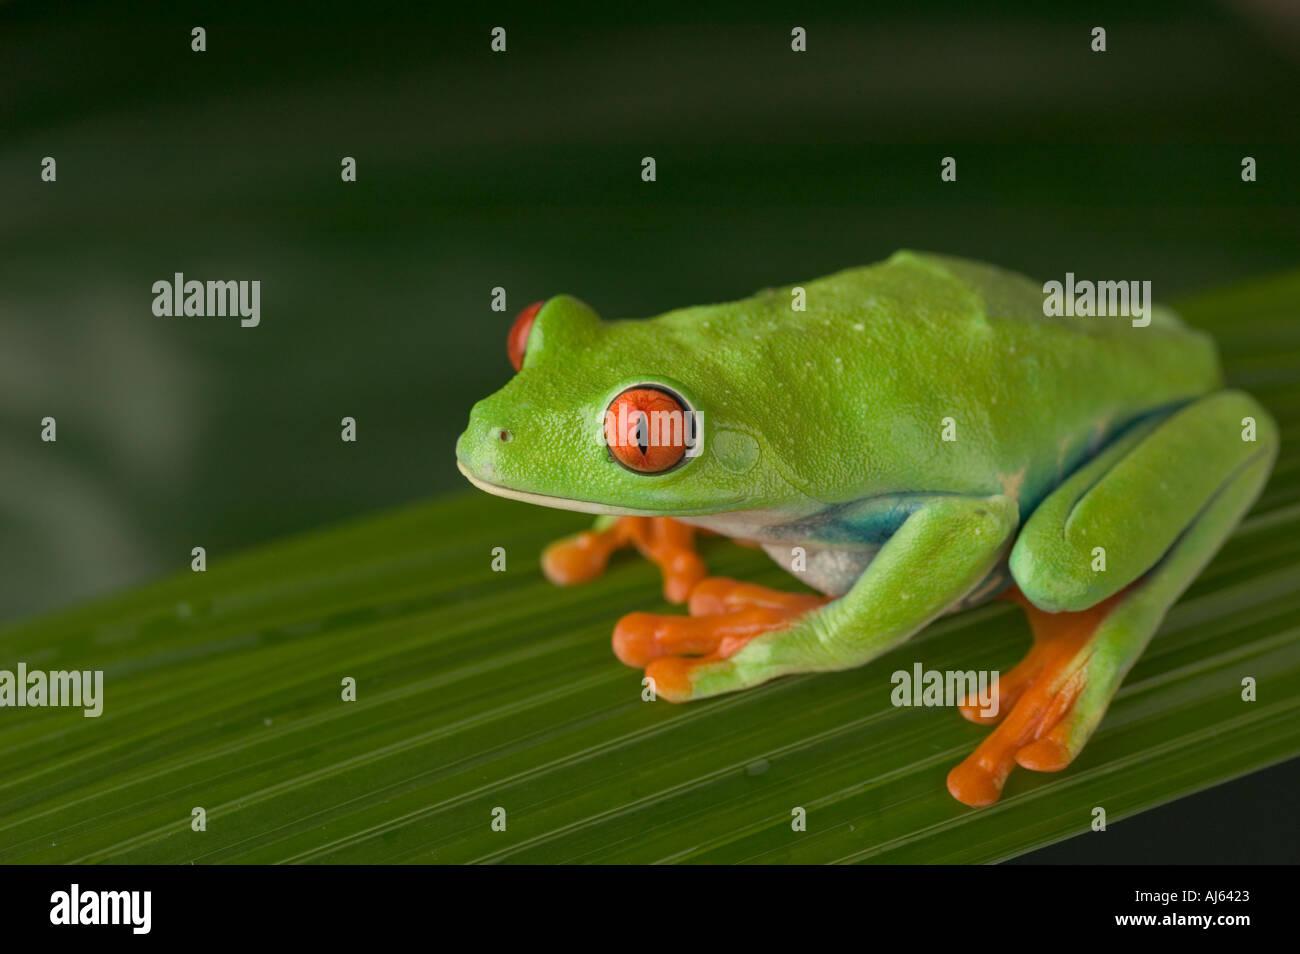 Frog Graphic Imágenes De Stock & Frog Graphic Fotos De Stock - Alamy